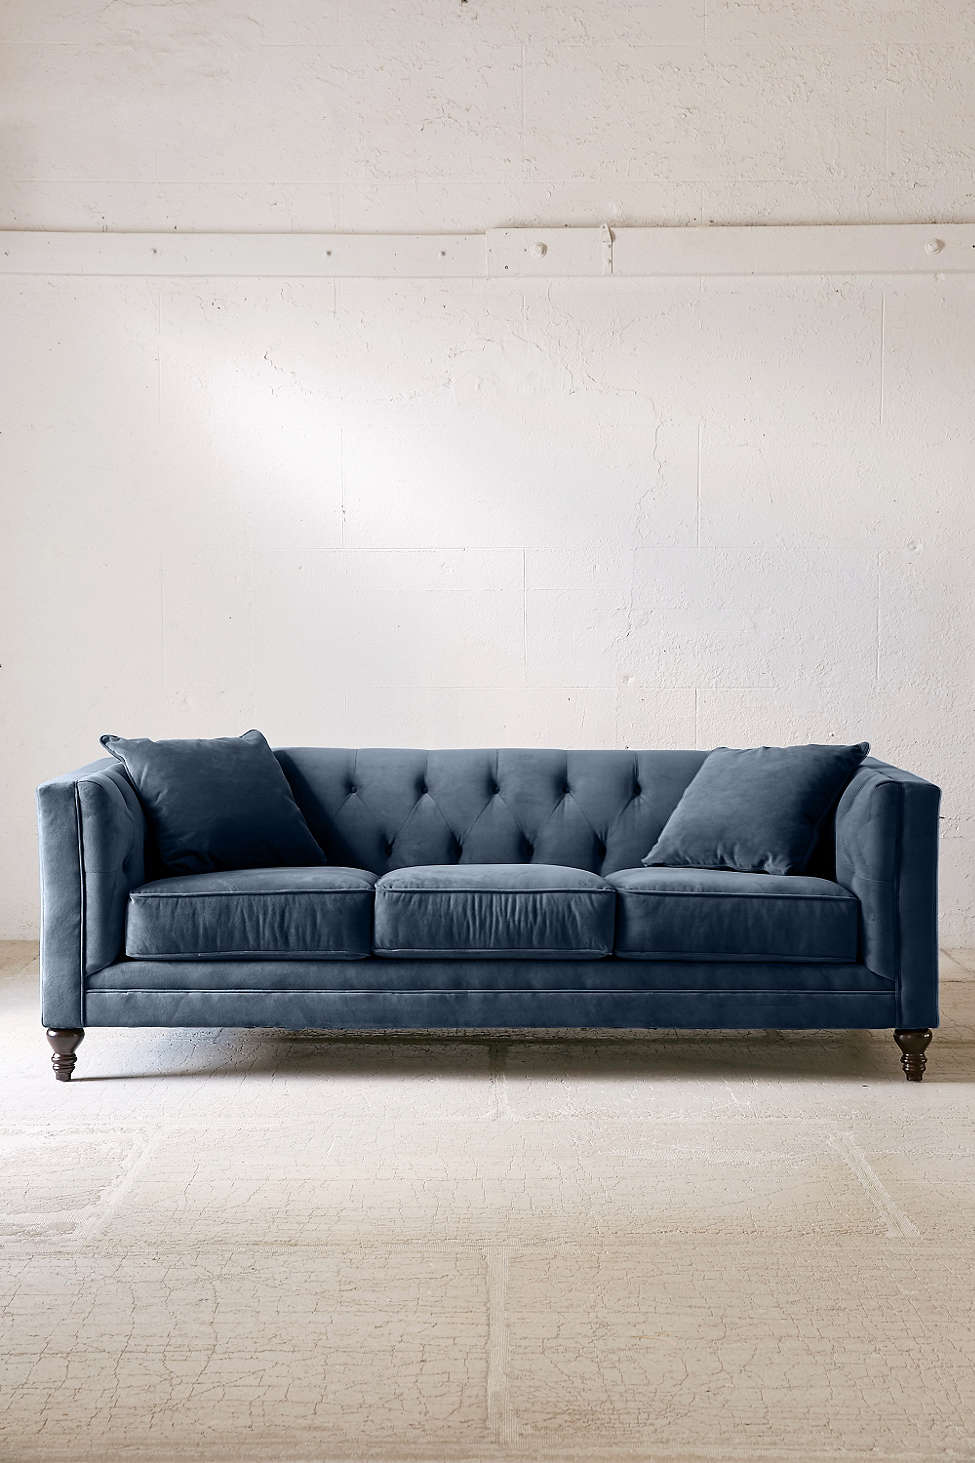 samt couch elegant with samt couch affordable with samt. Black Bedroom Furniture Sets. Home Design Ideas